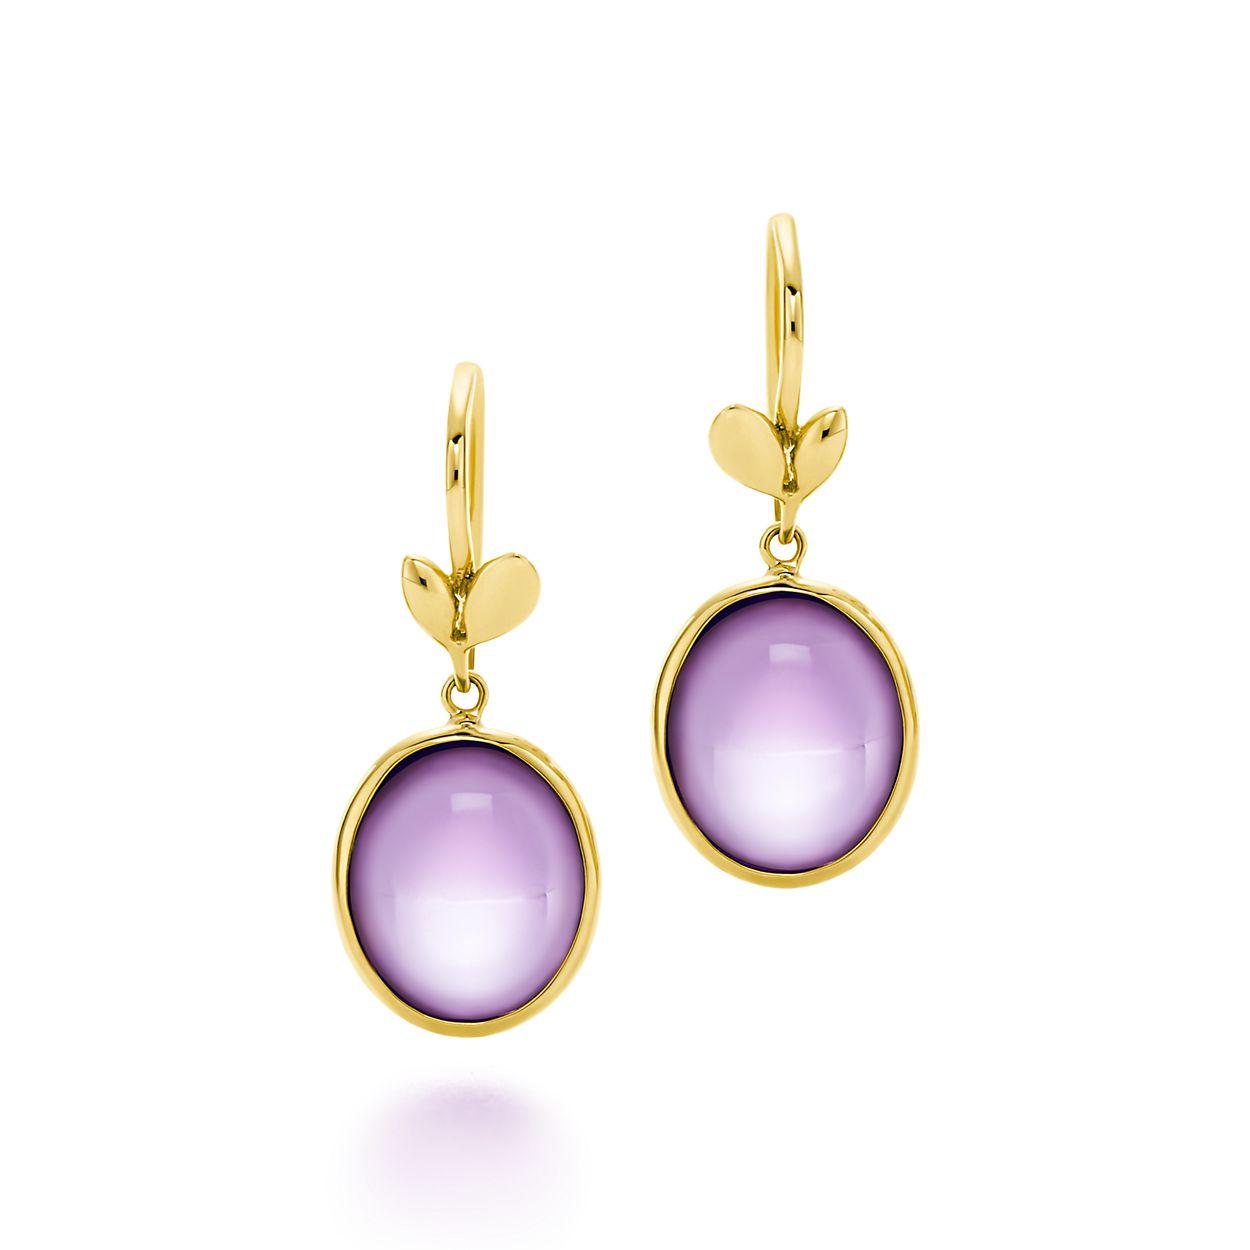 Paloma Pico Olive Leaf Drop Earrings